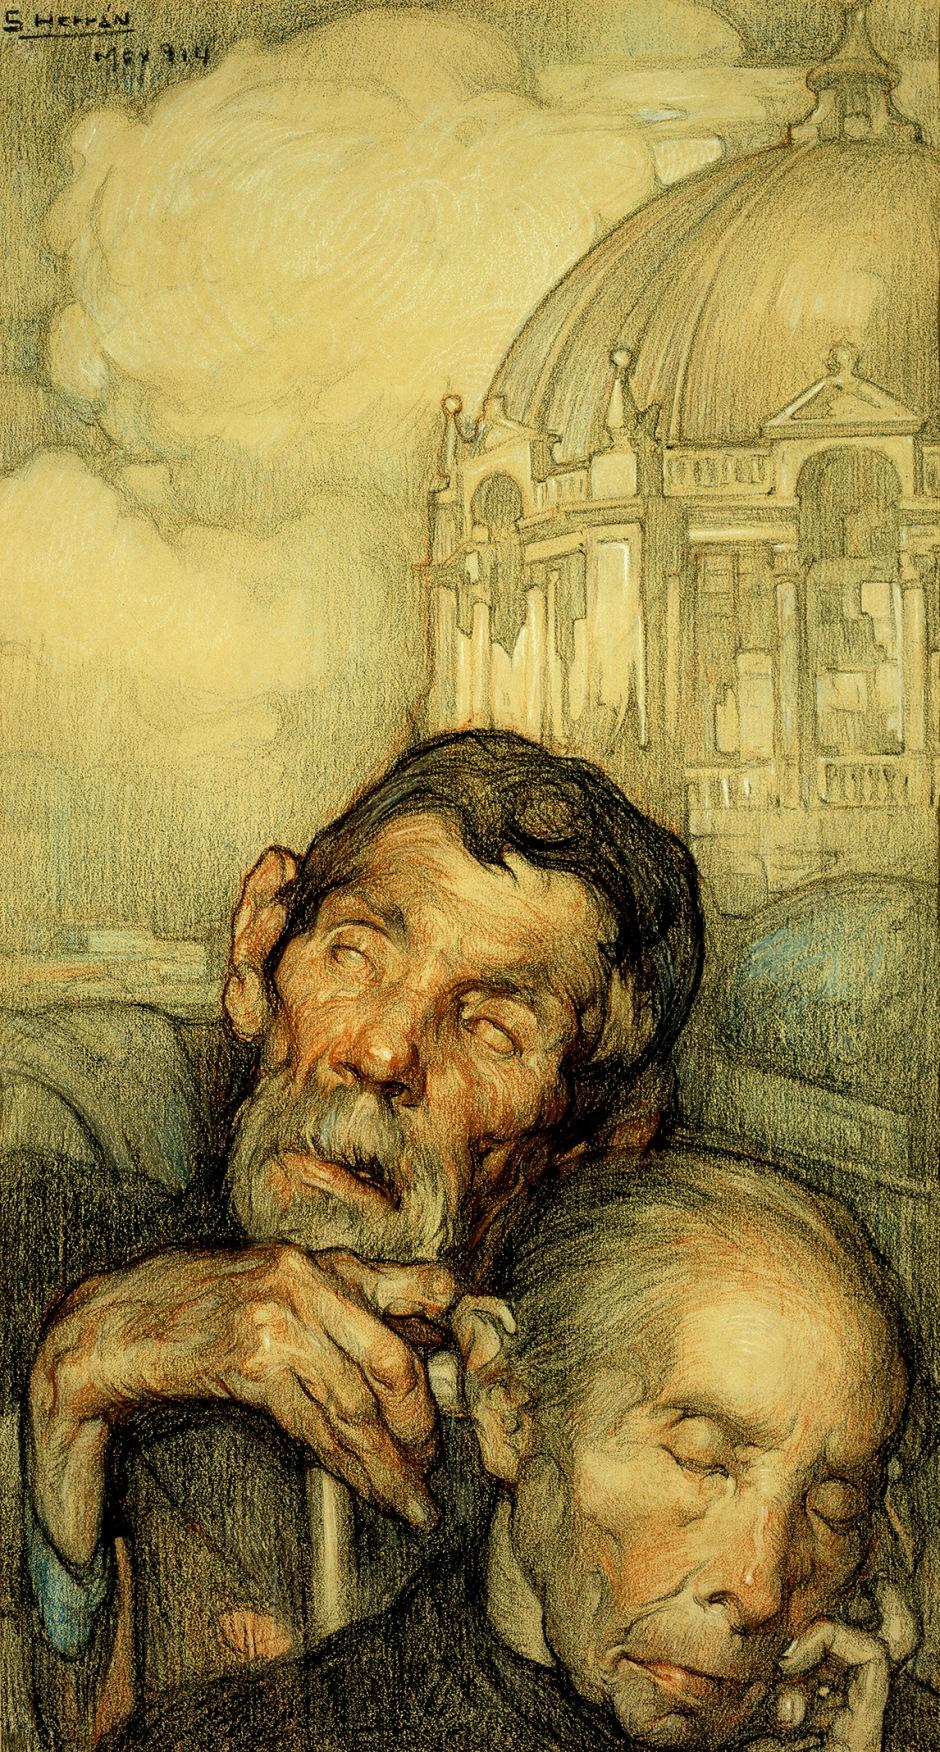 Saturnino Herrán, Los ciegos